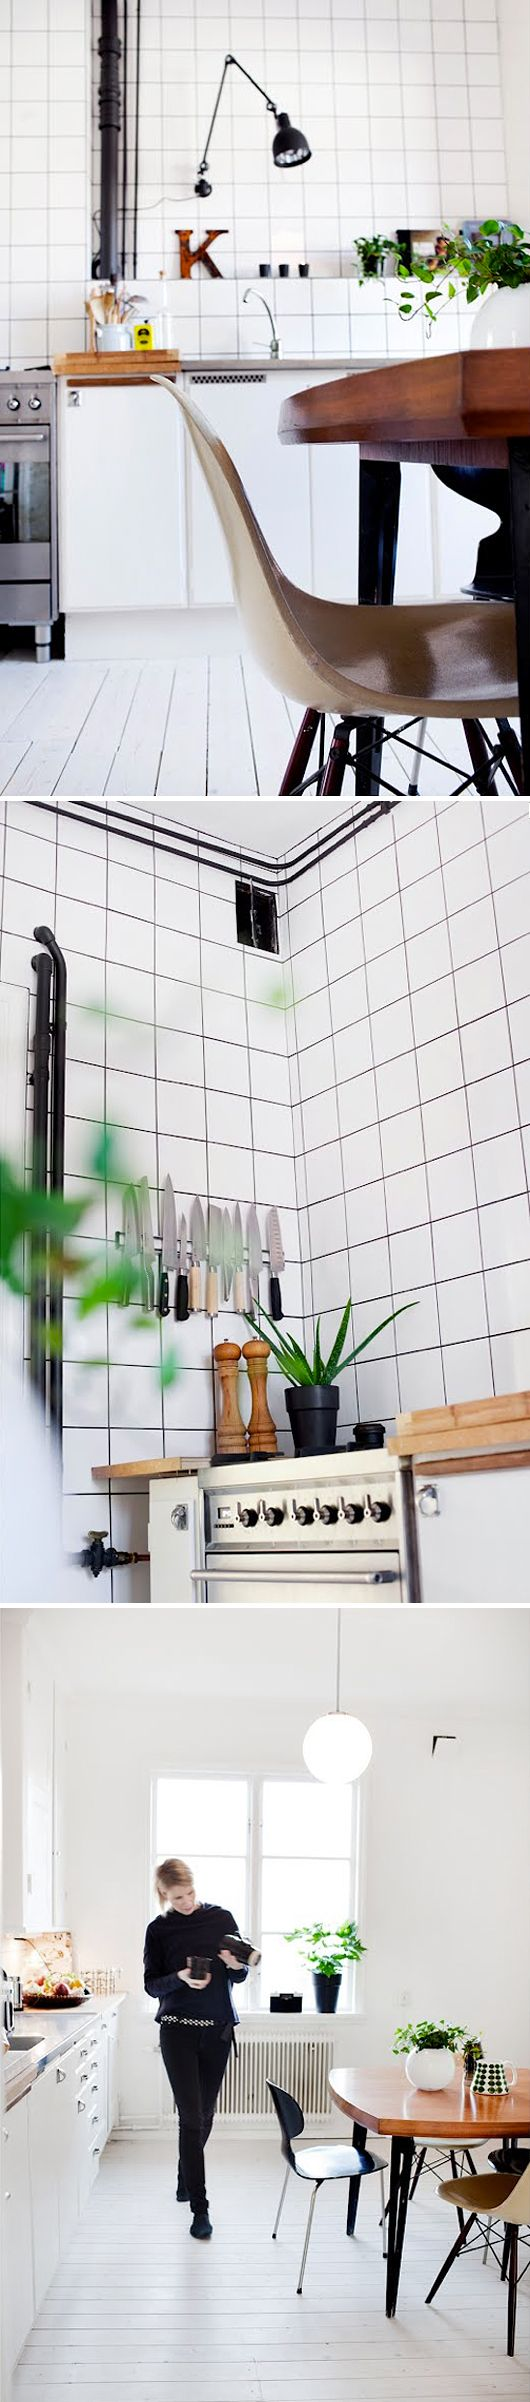 Here they are again; the characteristic door handles: http://www.byggfabriken.com/sortiment/beslag/knoppar-och-handtag/info/produkter/584-421-skaapregel/